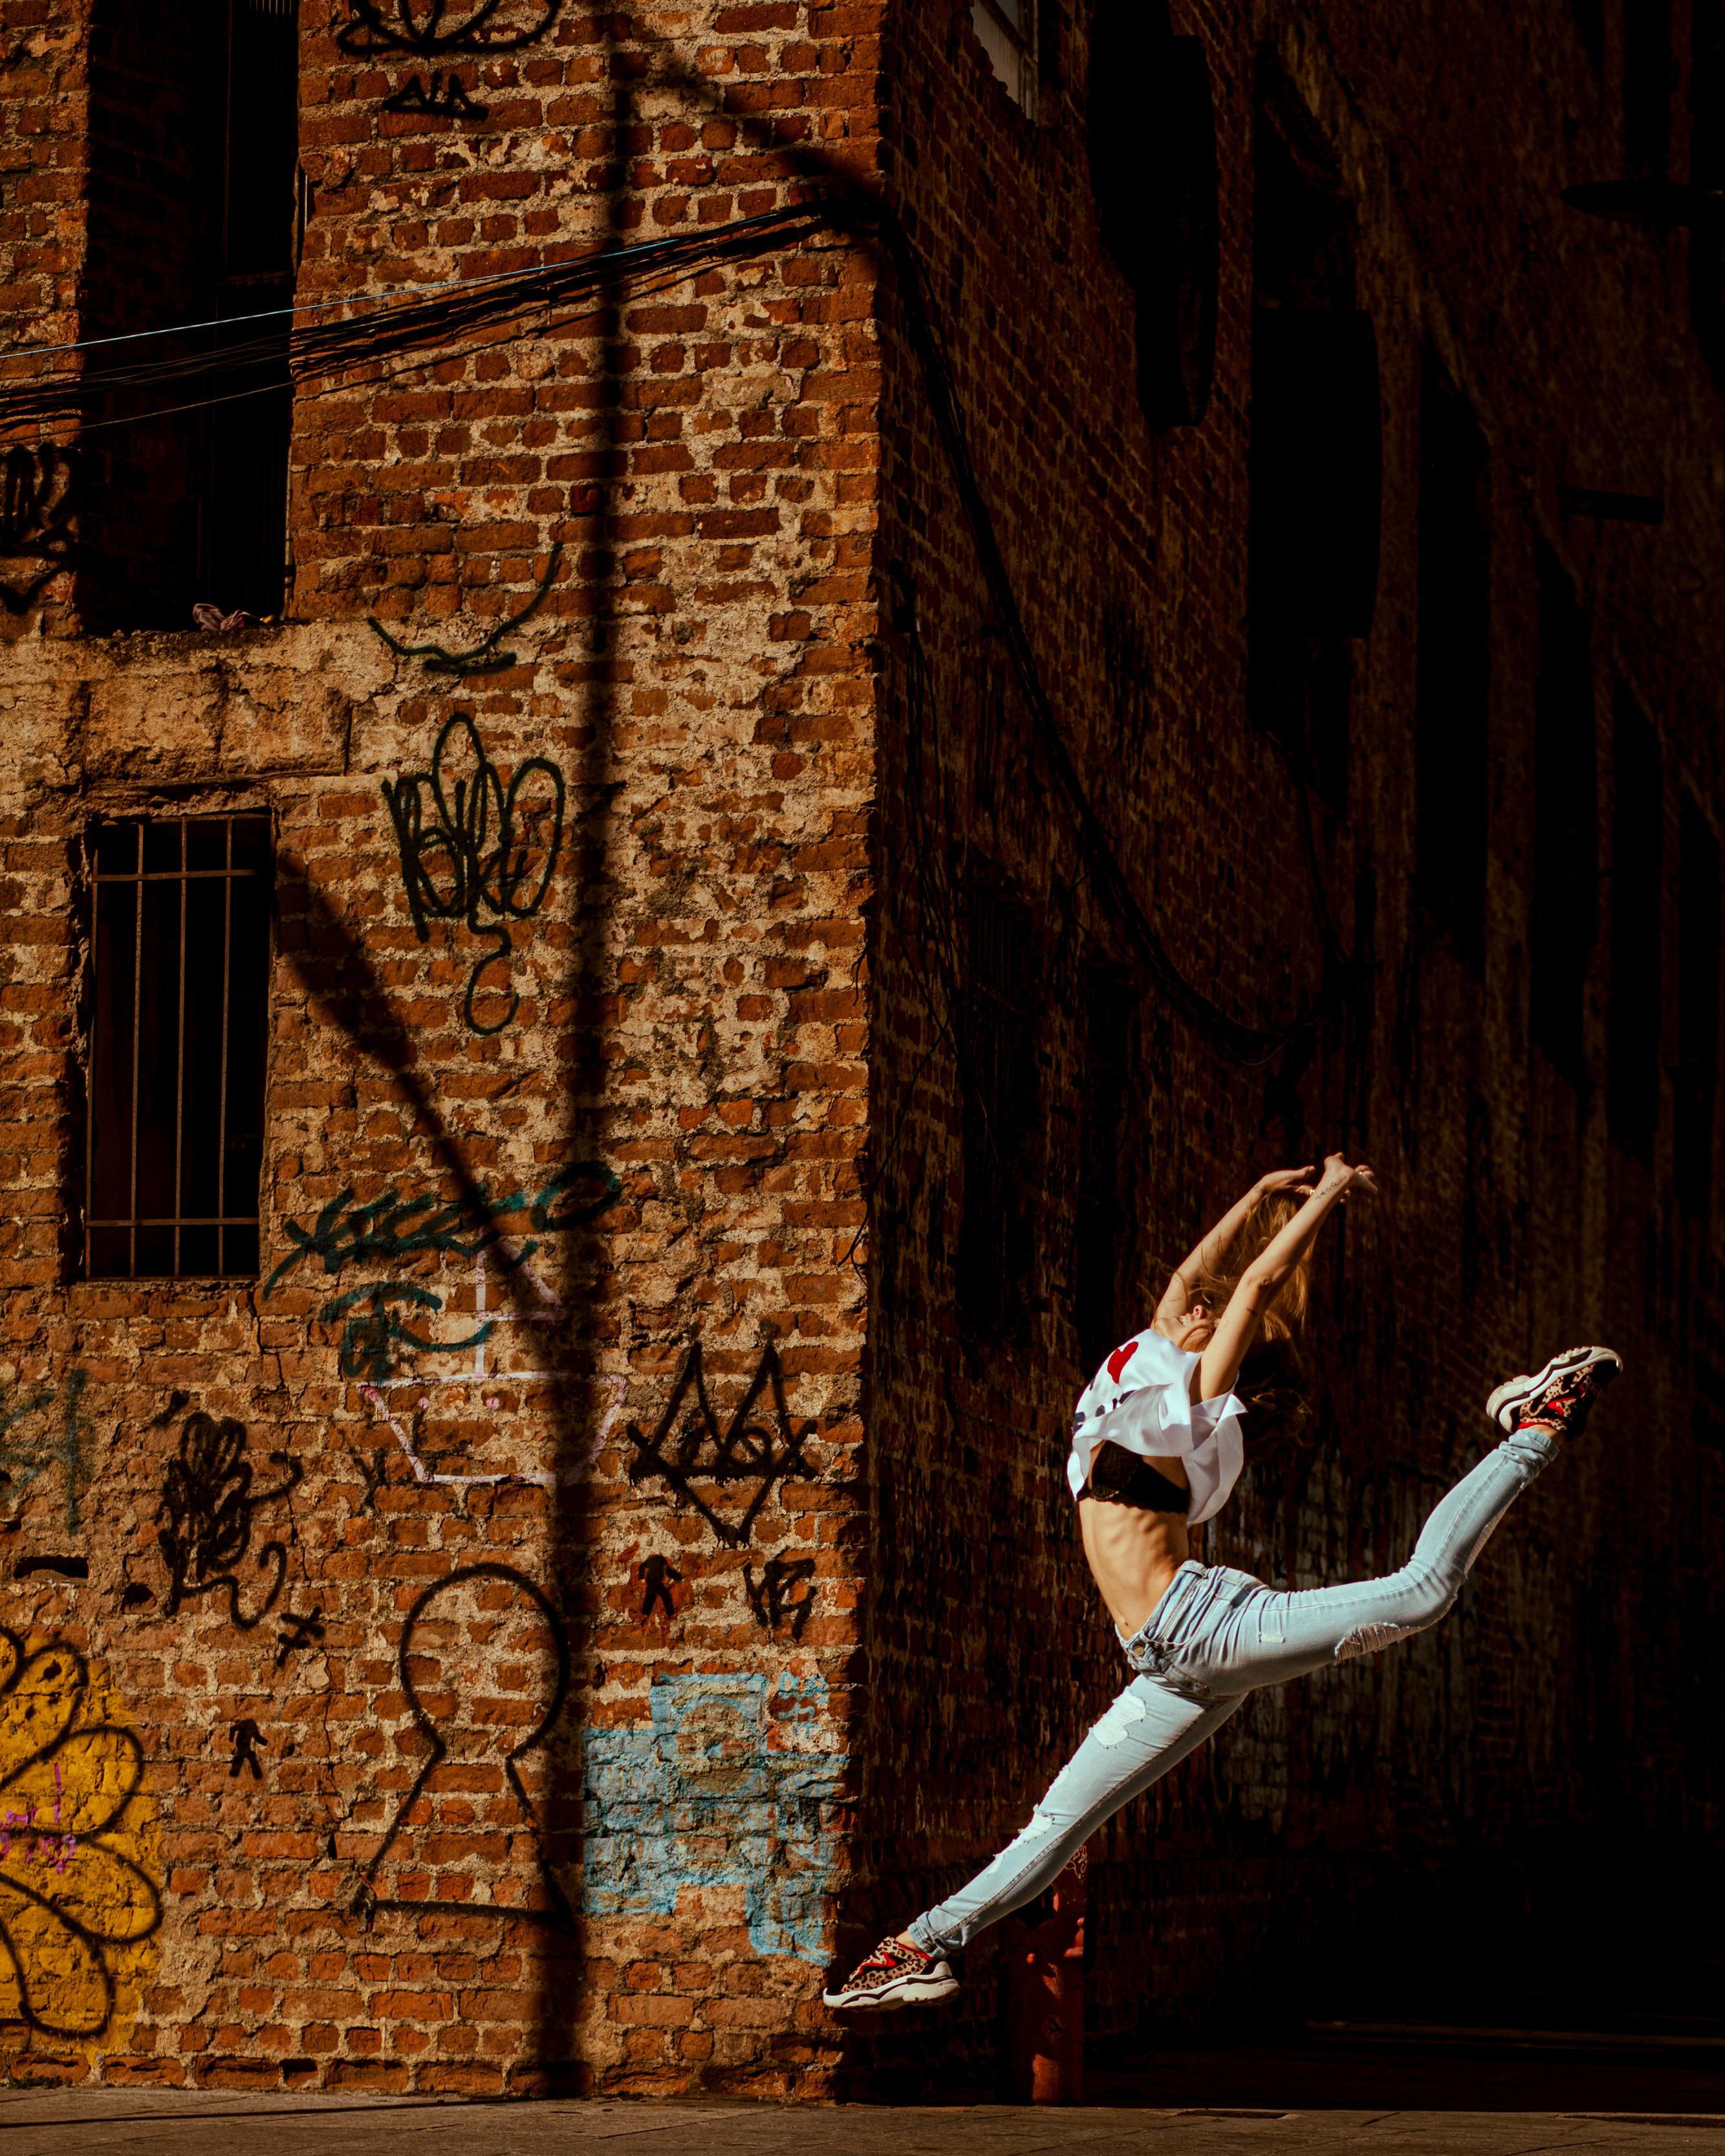 Woman Jumping Near Brick Building